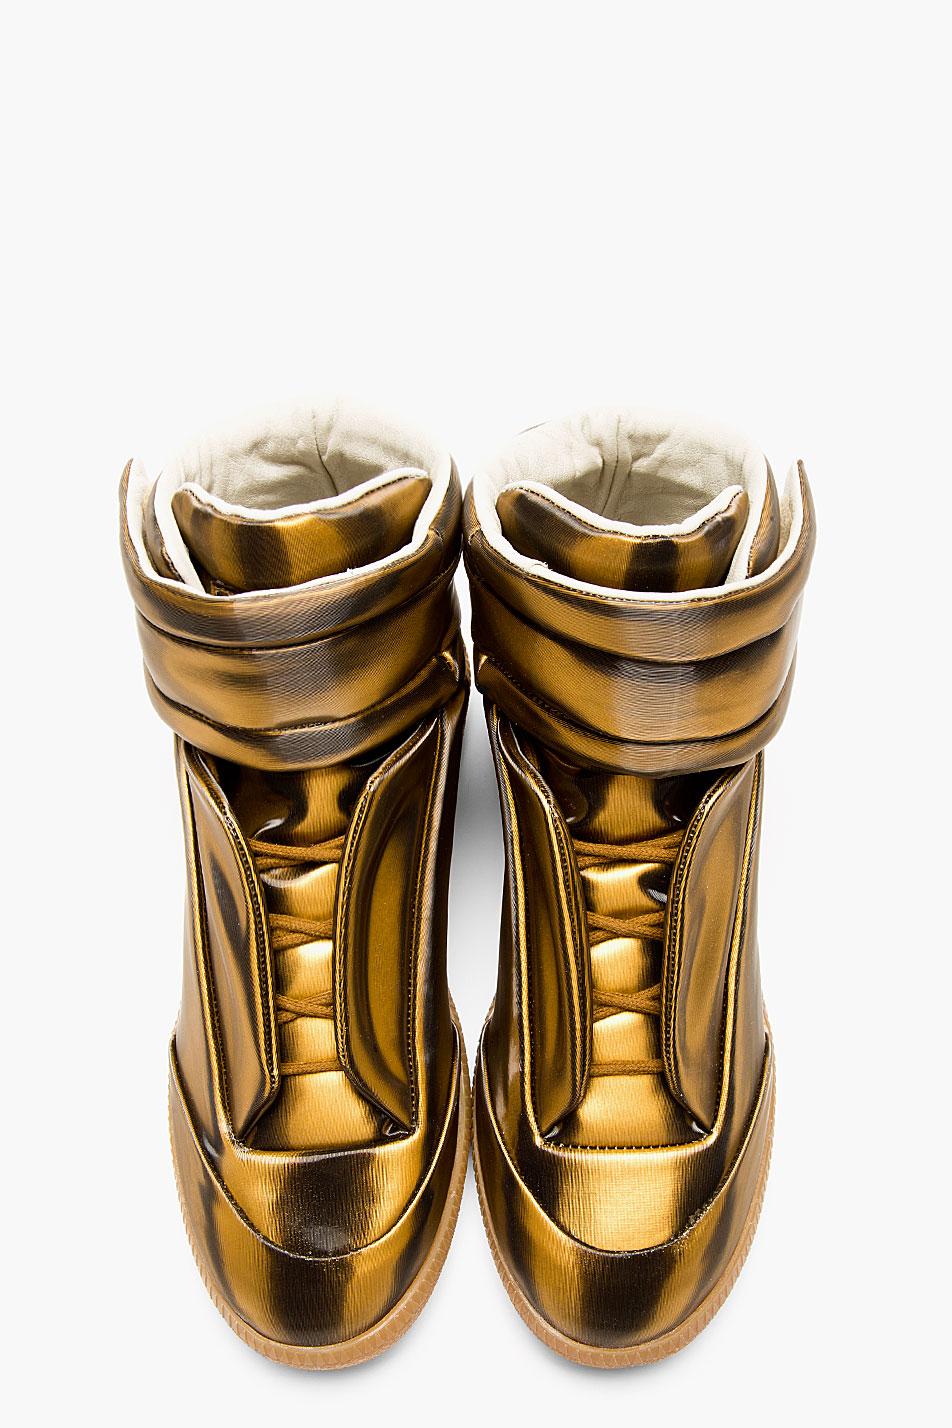 Copper Glossy Vinyl Maison Martin Margiela Gold Sneakers 1